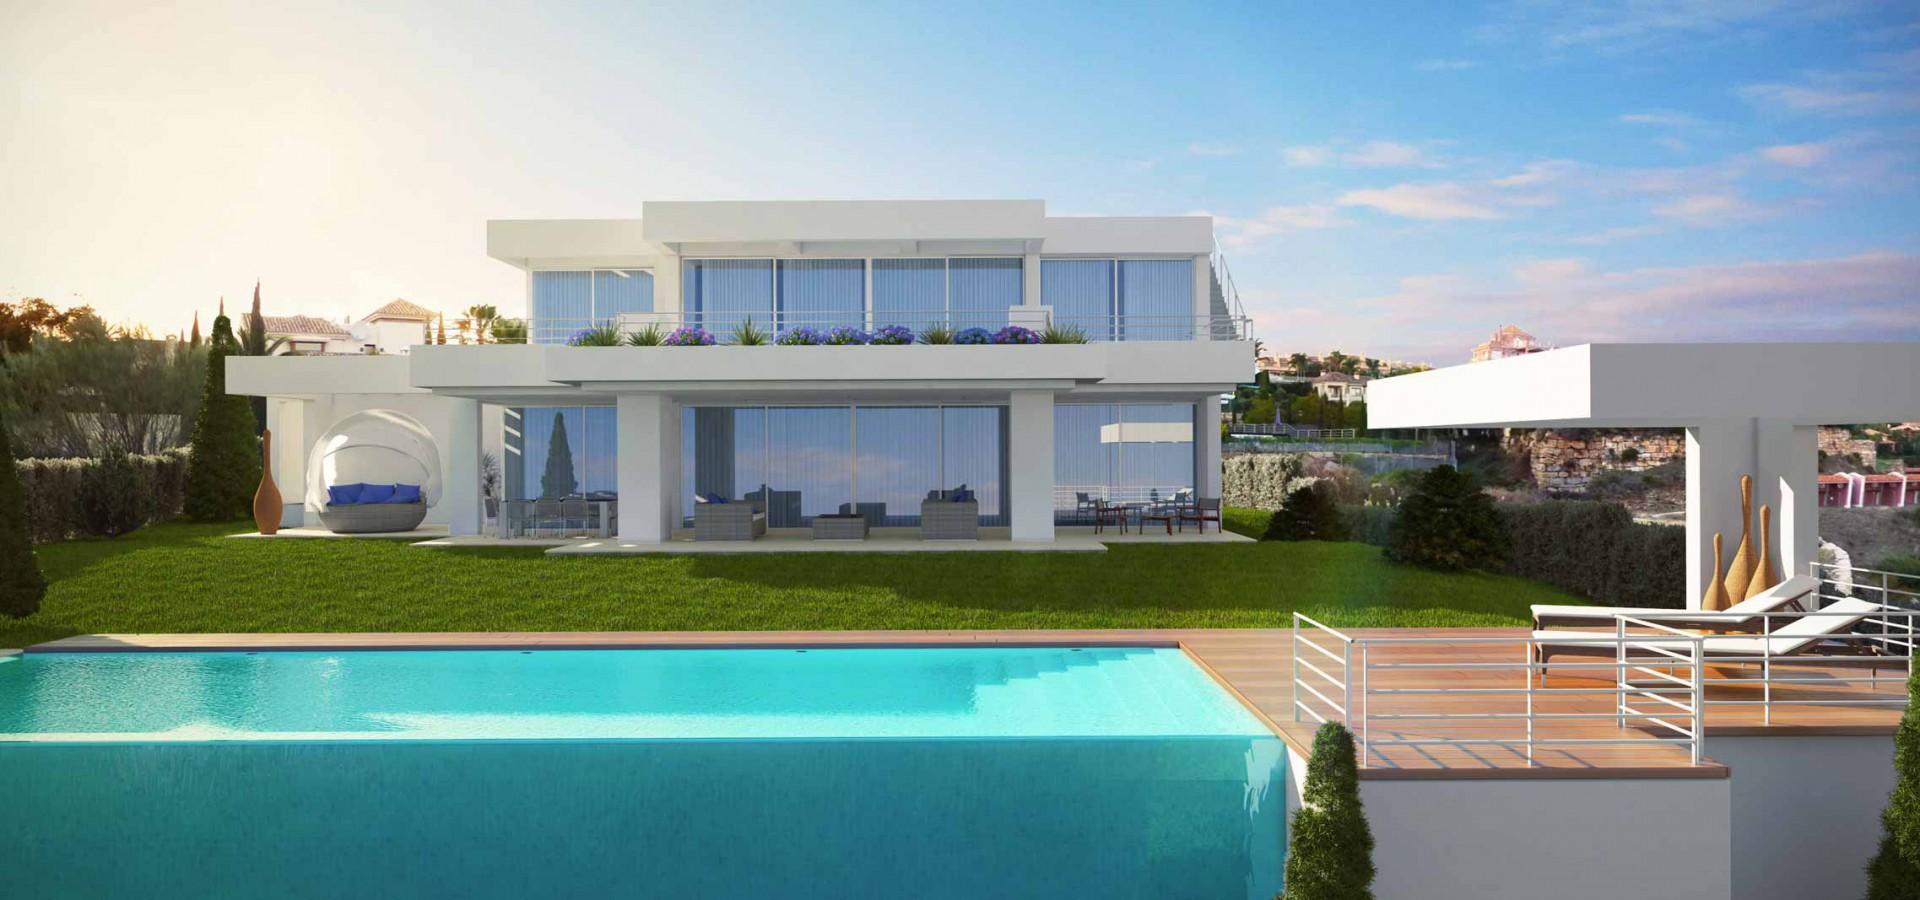 Design villa te koop in los flamingos benahavis spanje specials - Moderne wasruimte ...